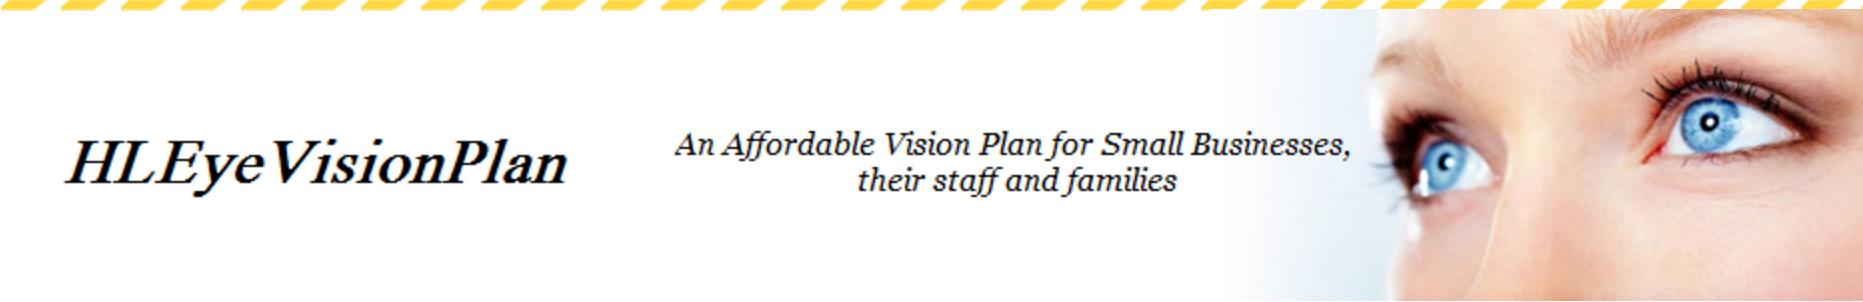 Dr. Daniels Vision Plan